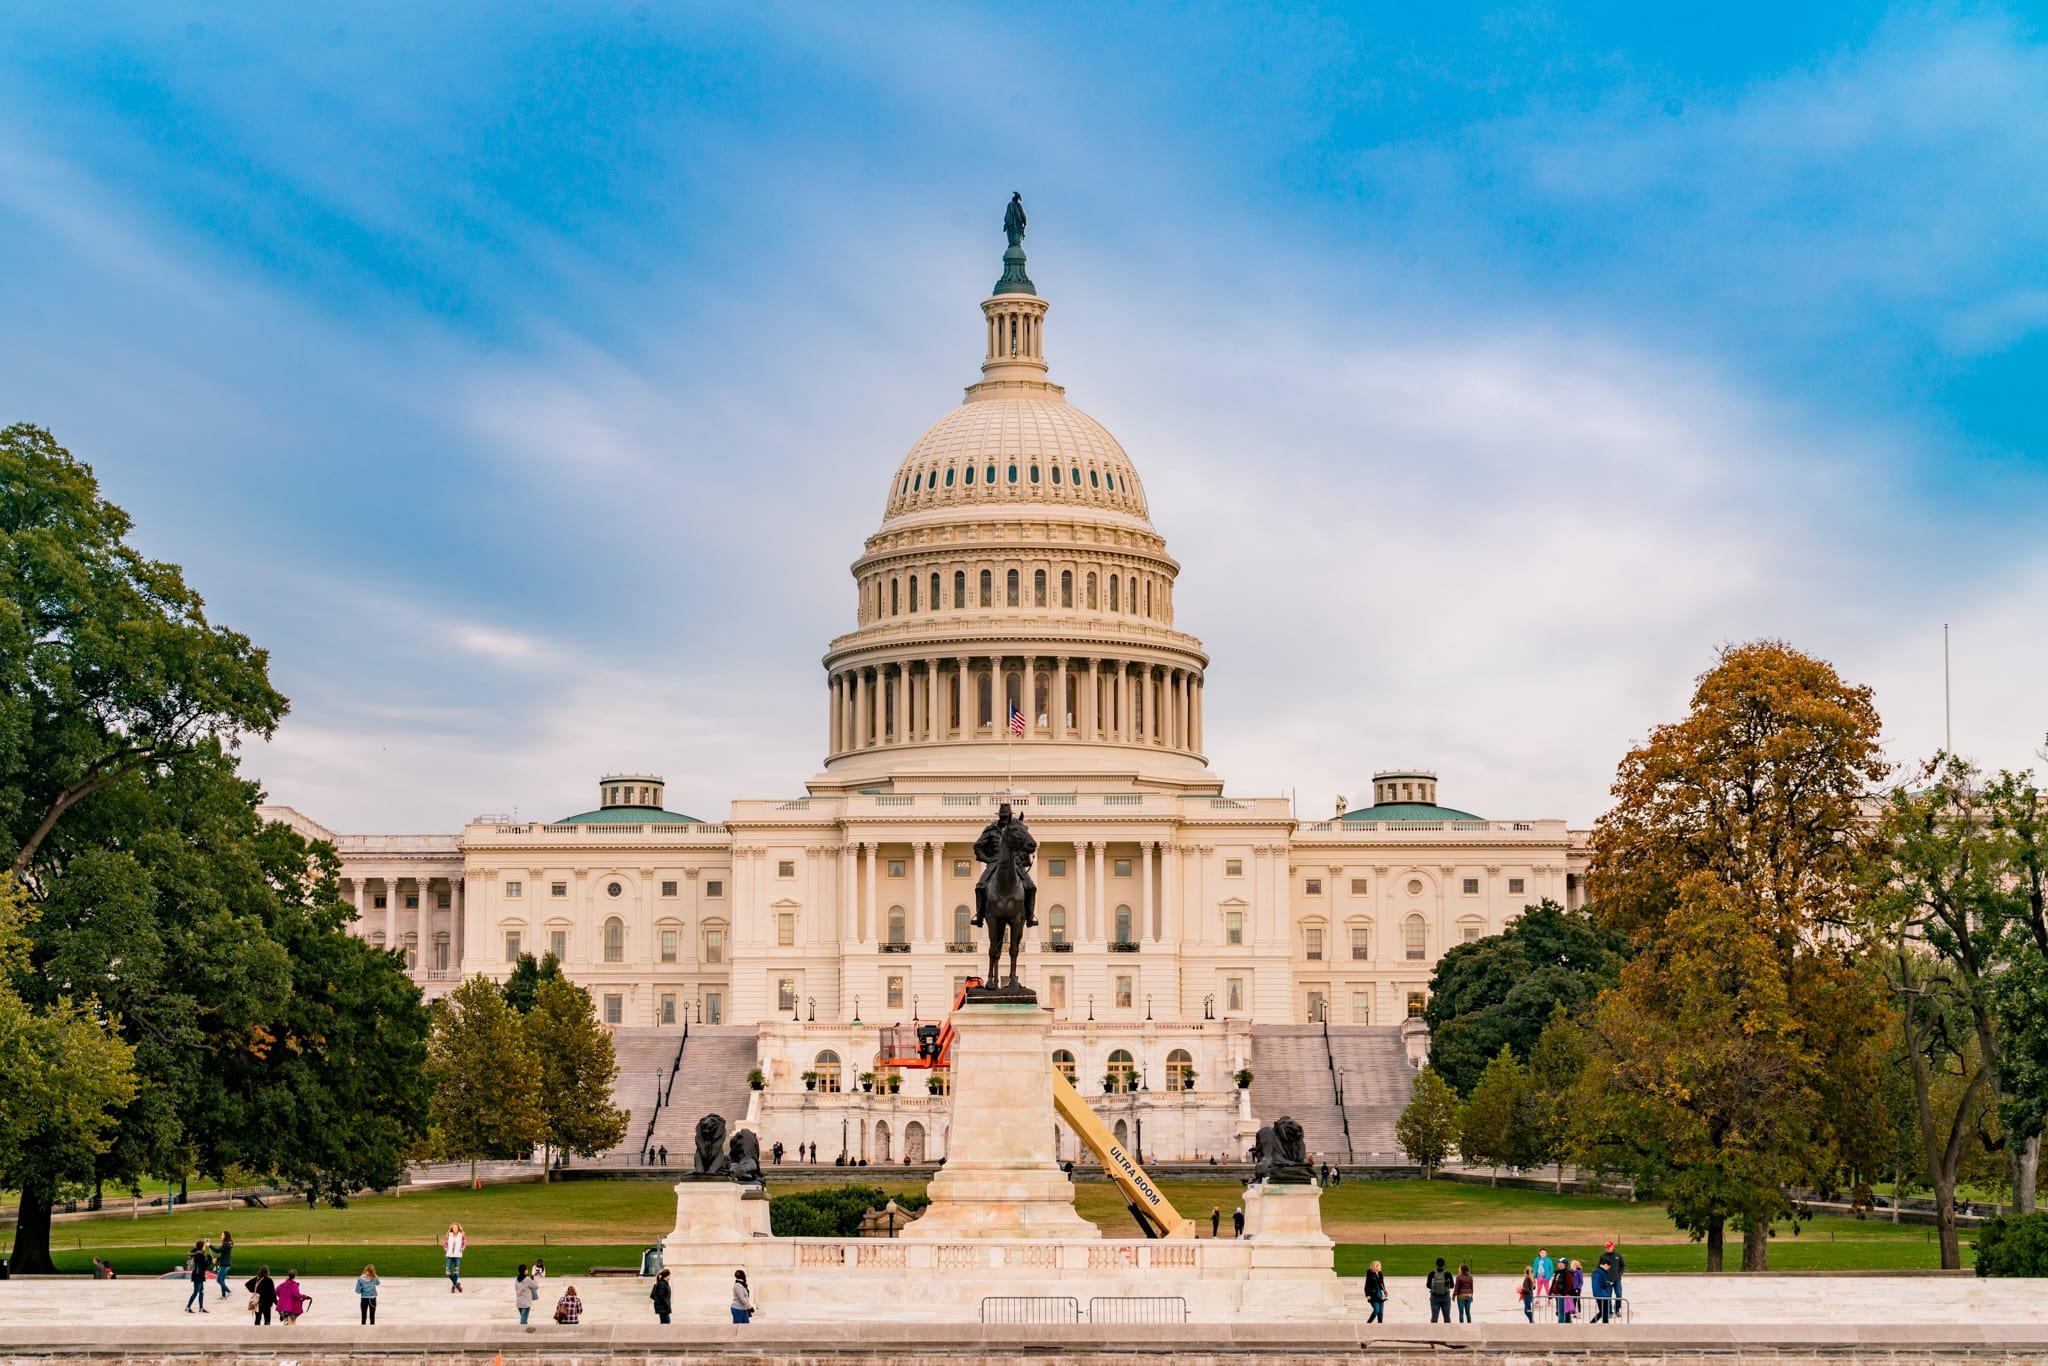 Apple is heading back to Washington, D.C.